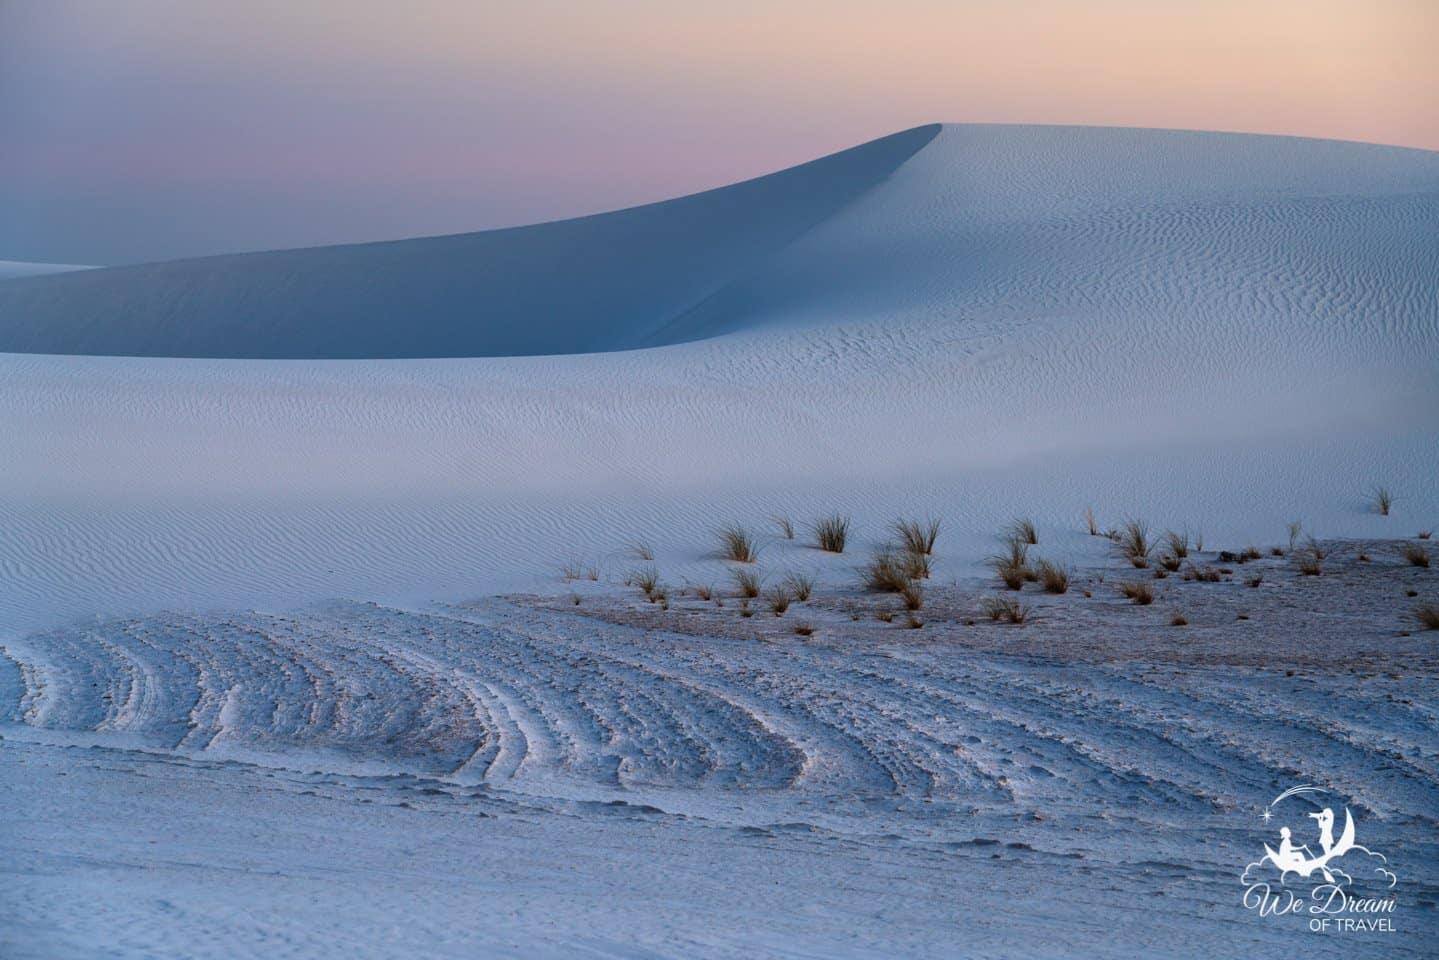 Soft light on the dunes of White Sands.